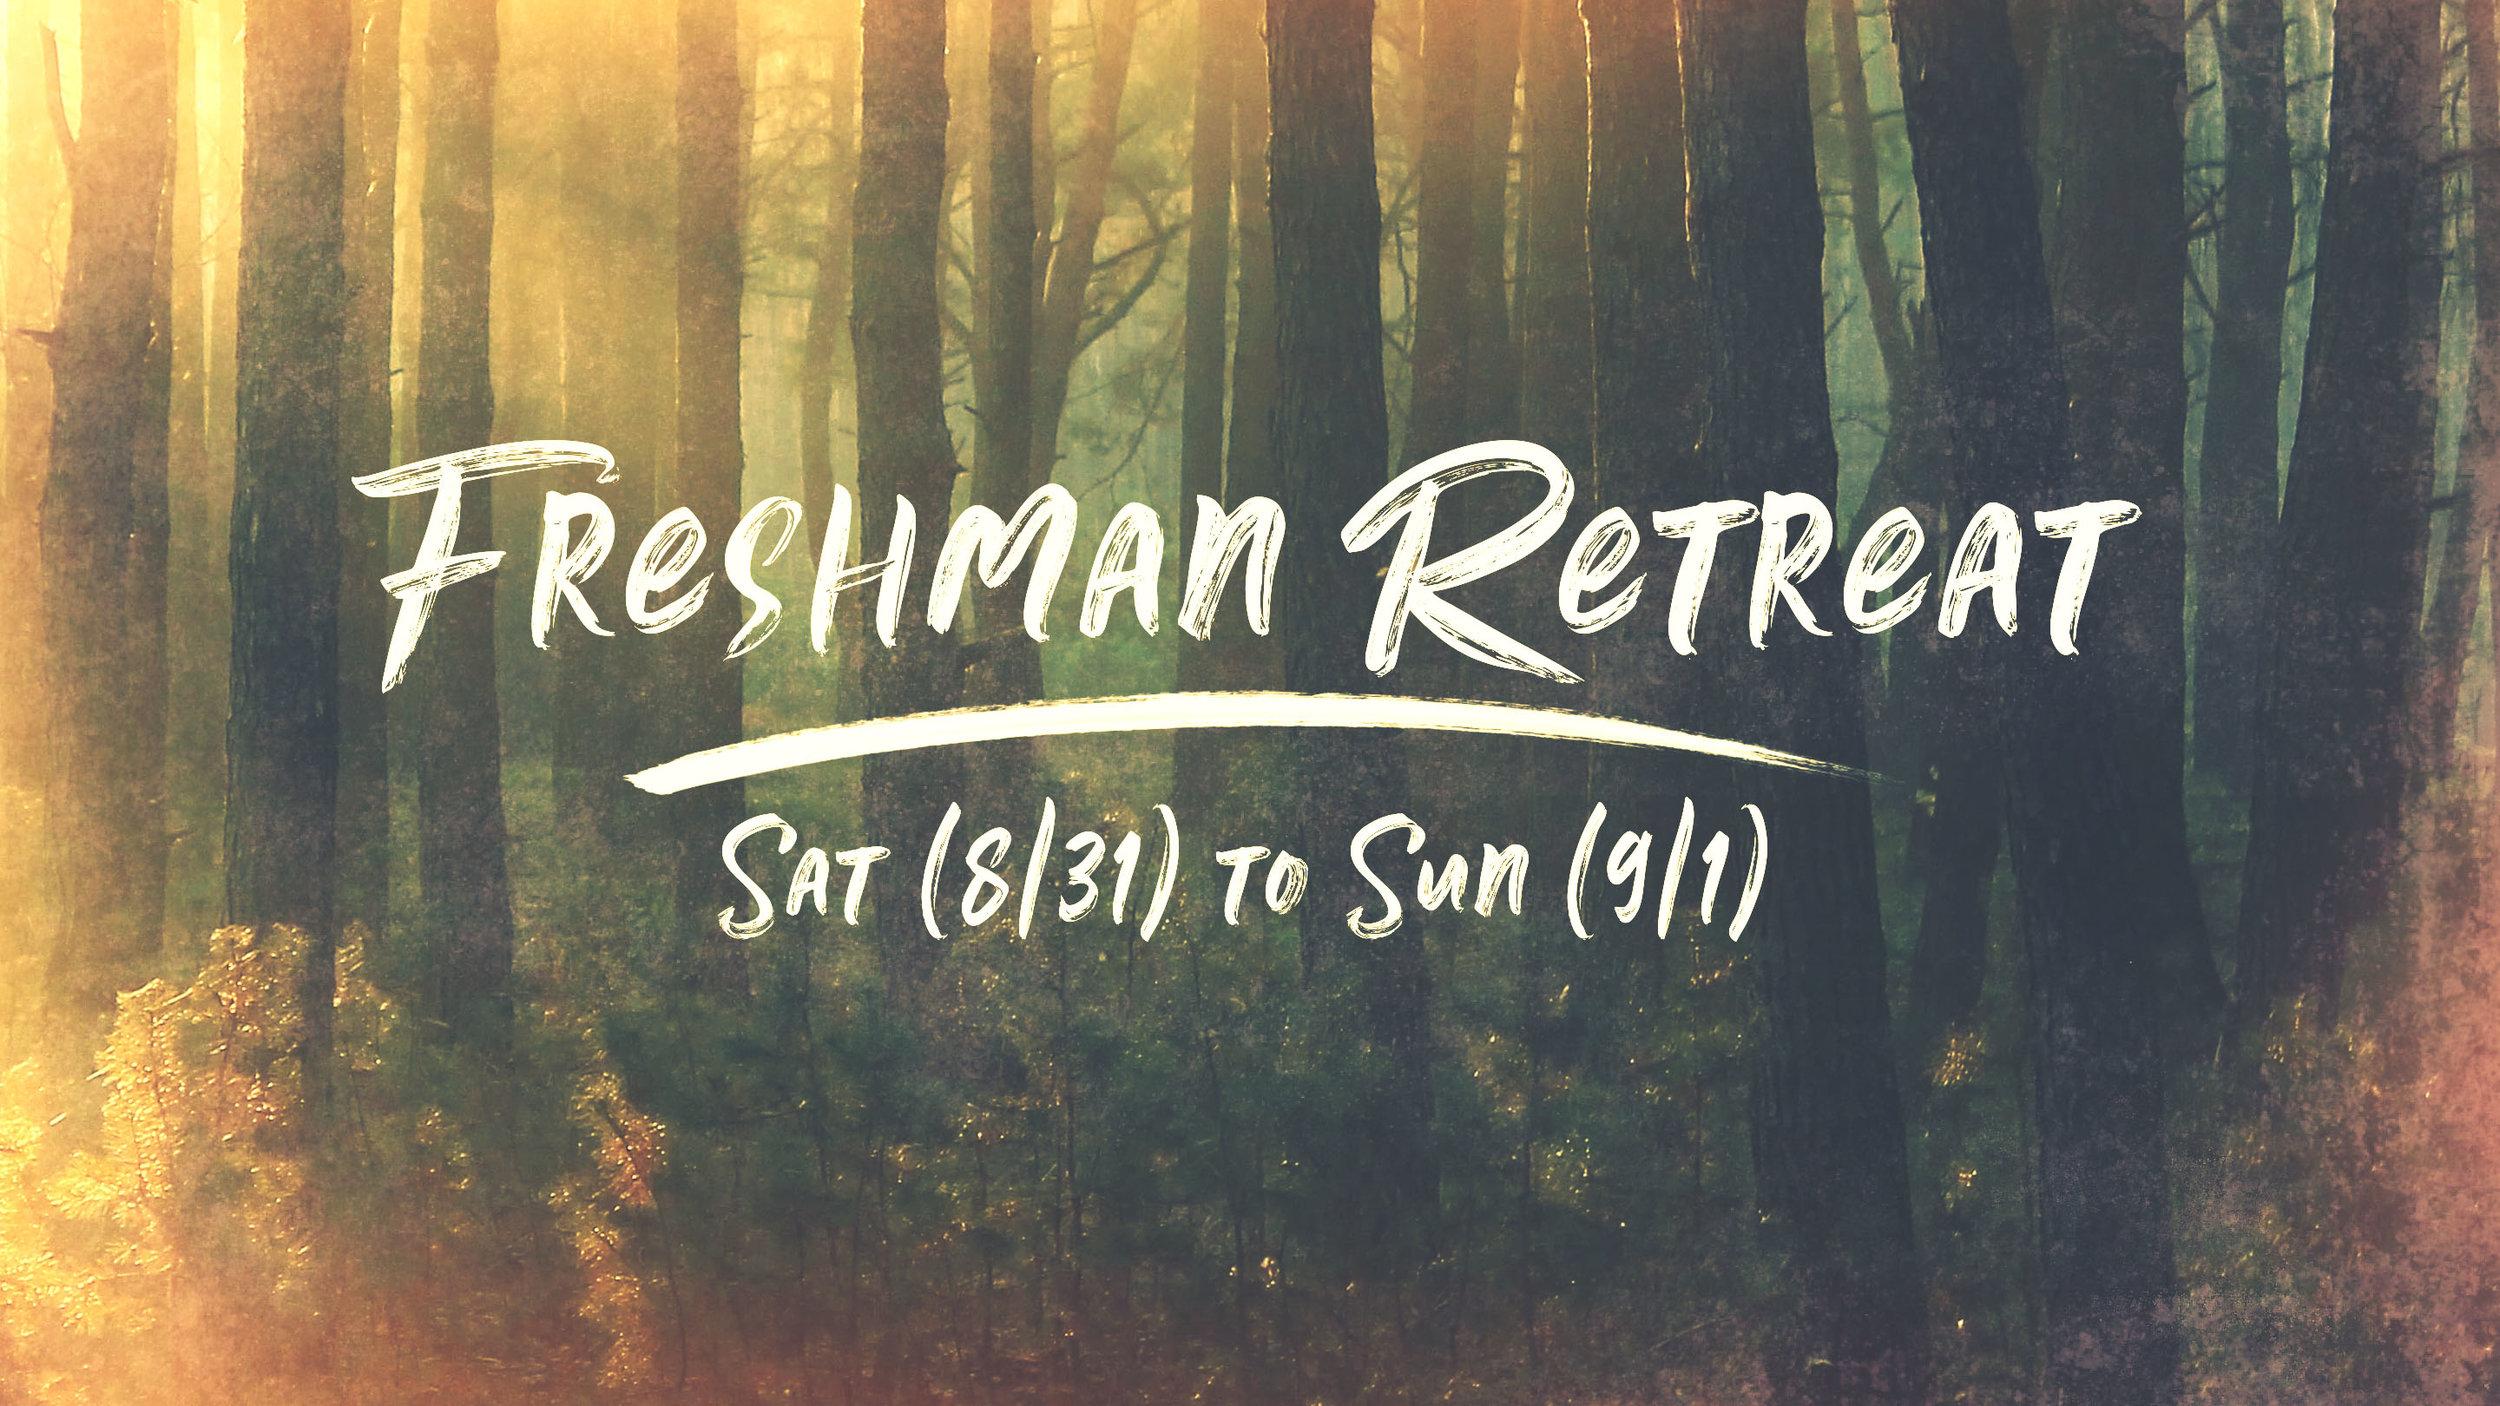 Freshman_Retreat_Splash_nolocation.jpg